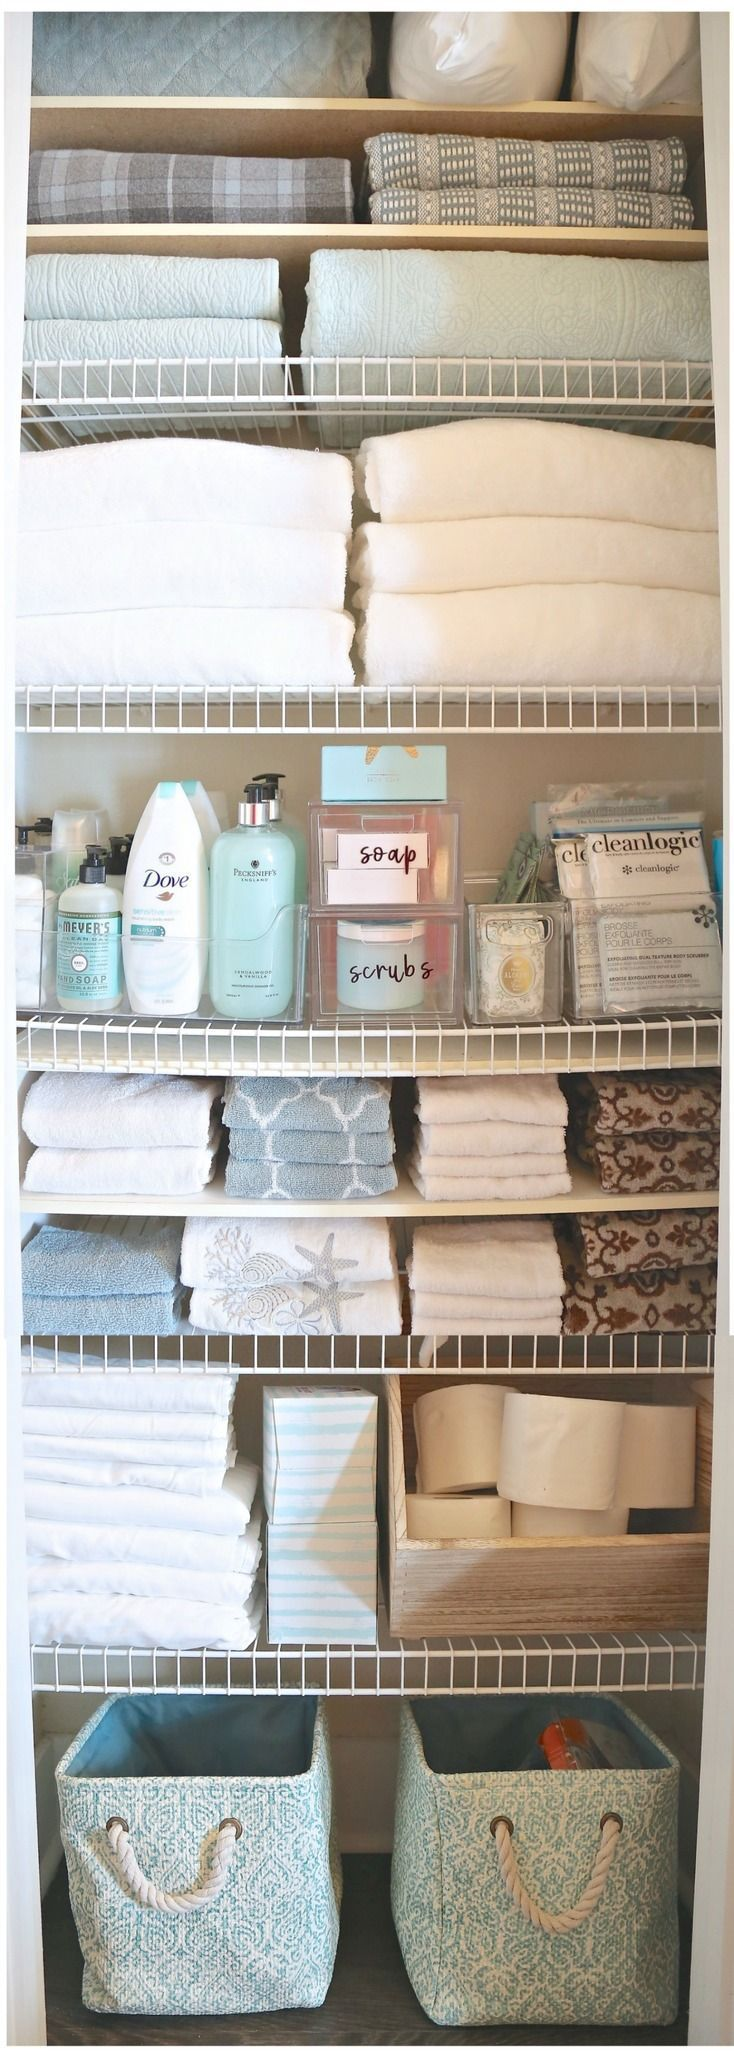 Creative ways to organize a linen closet or cabinet.